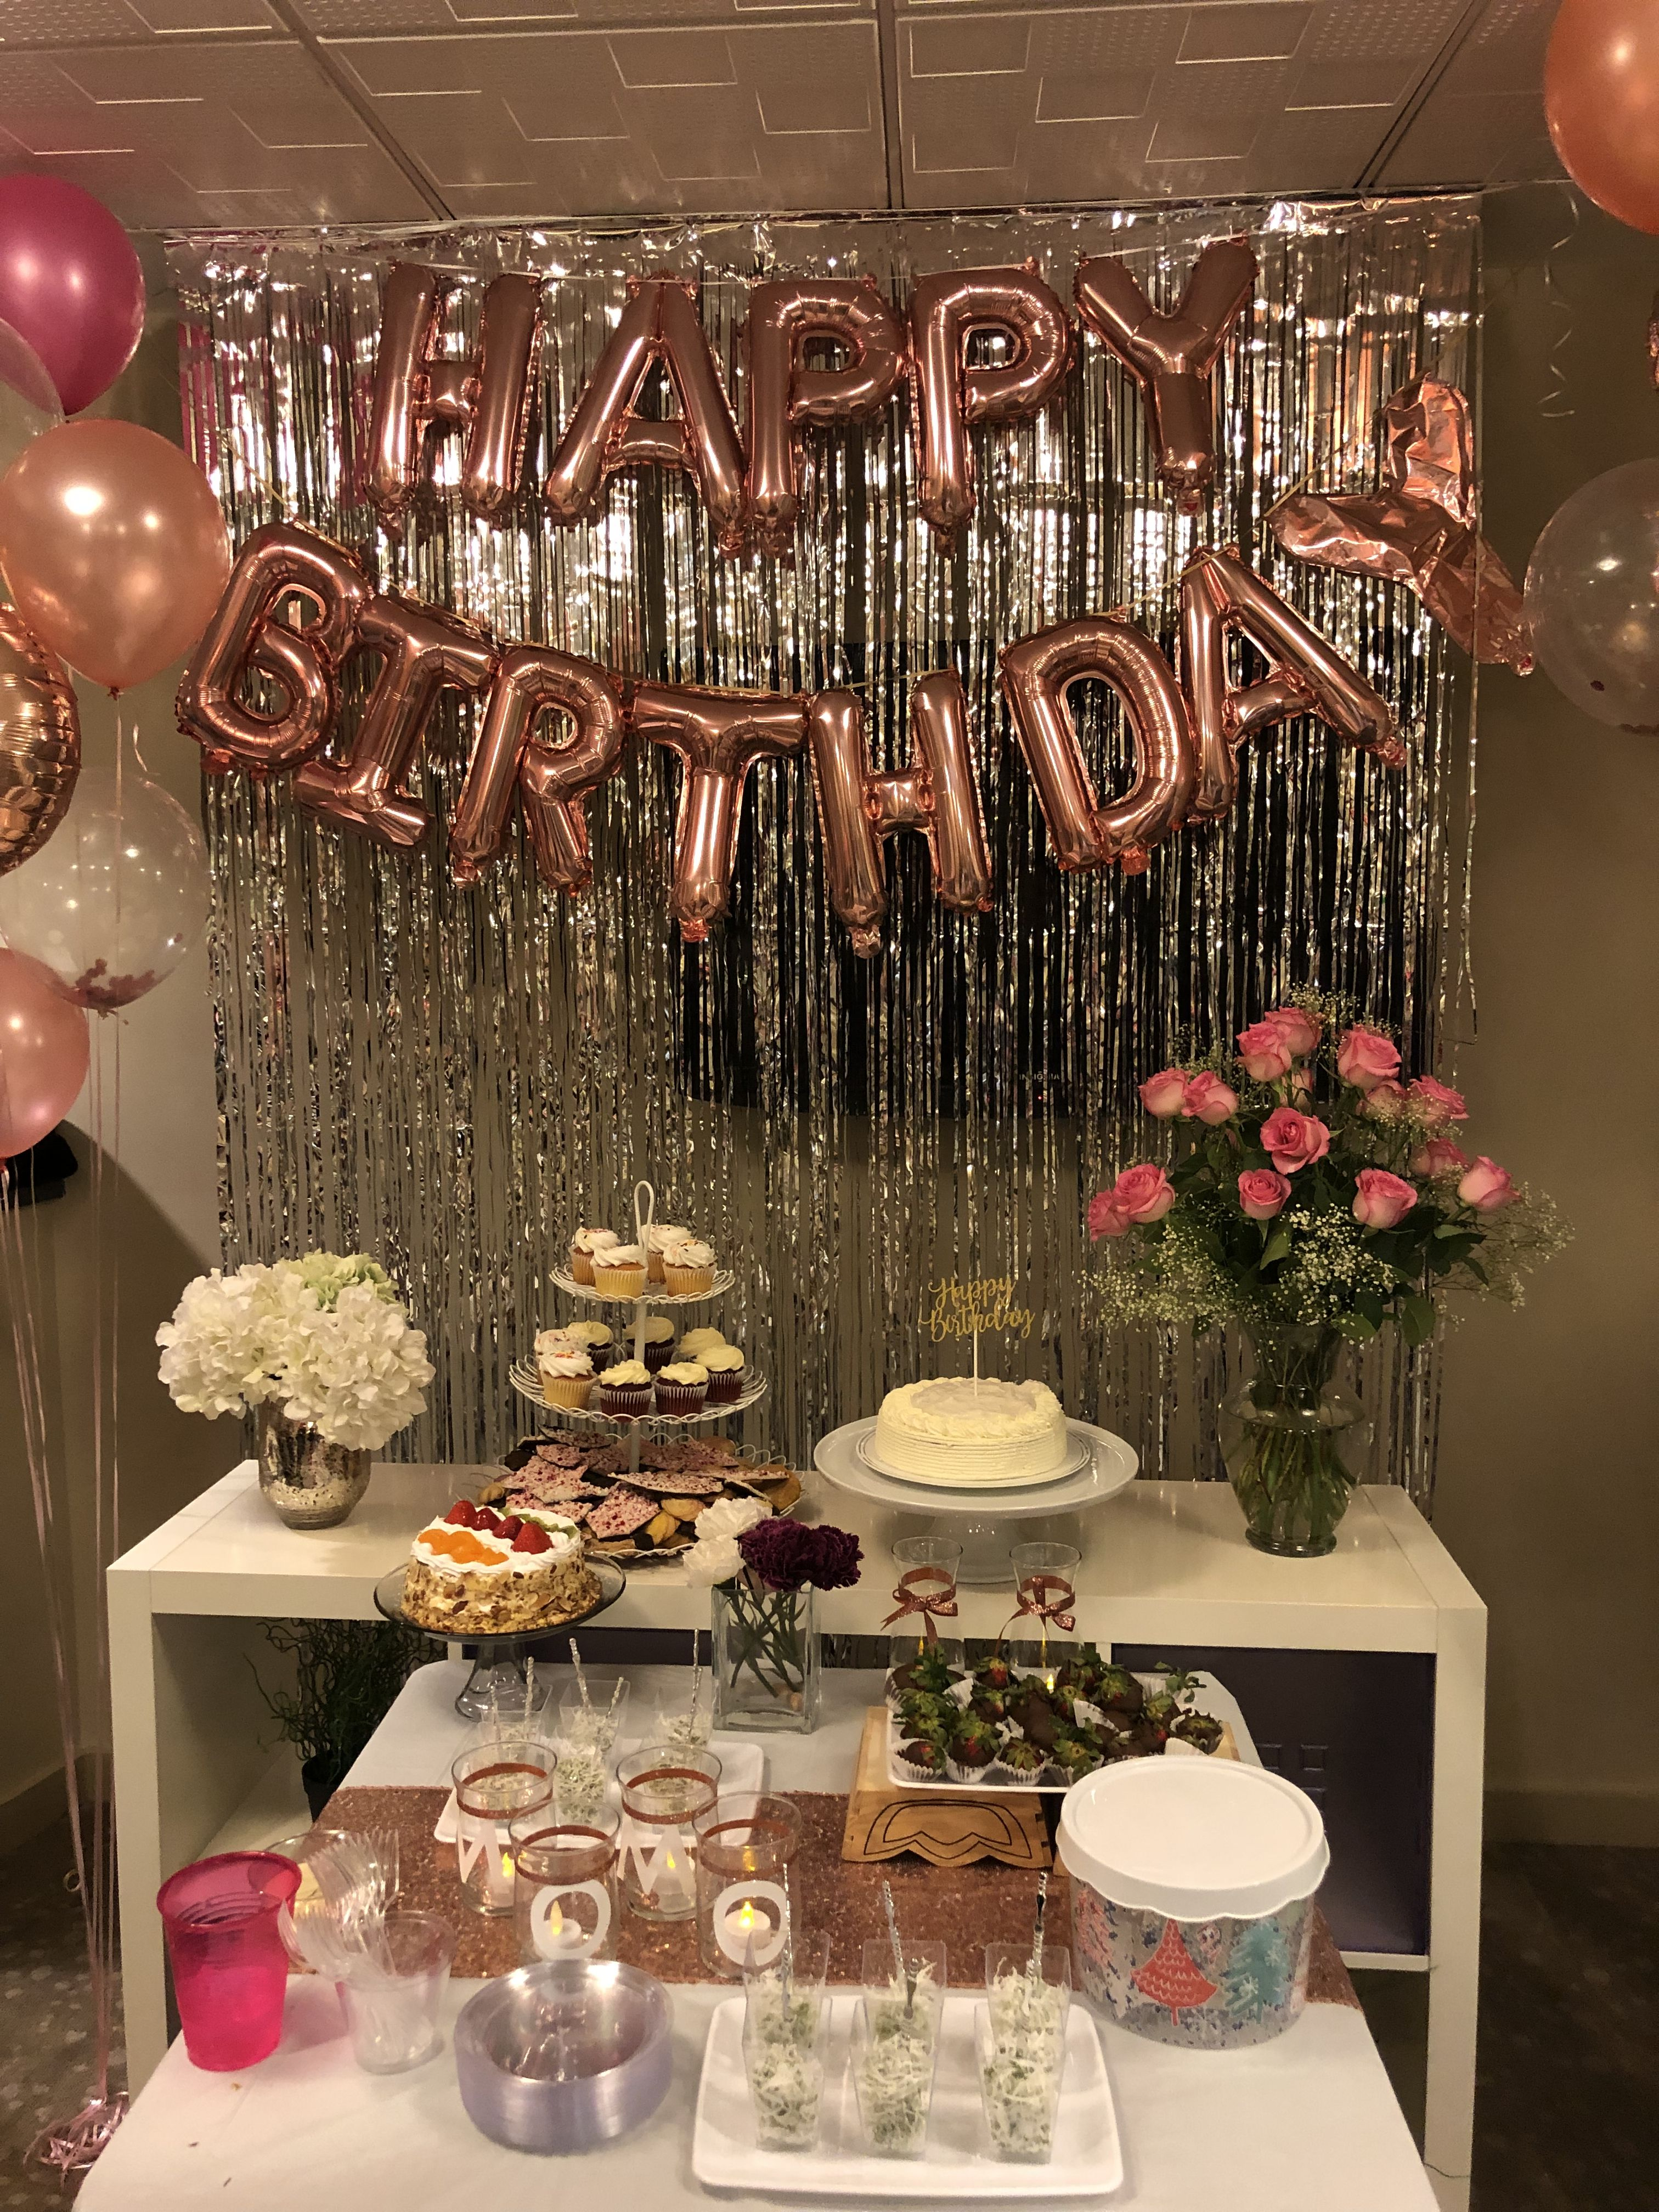 Pin by Jintana Tongchun on Rose gold birthday party ideas | Gold birthday, Gold birthday party ...